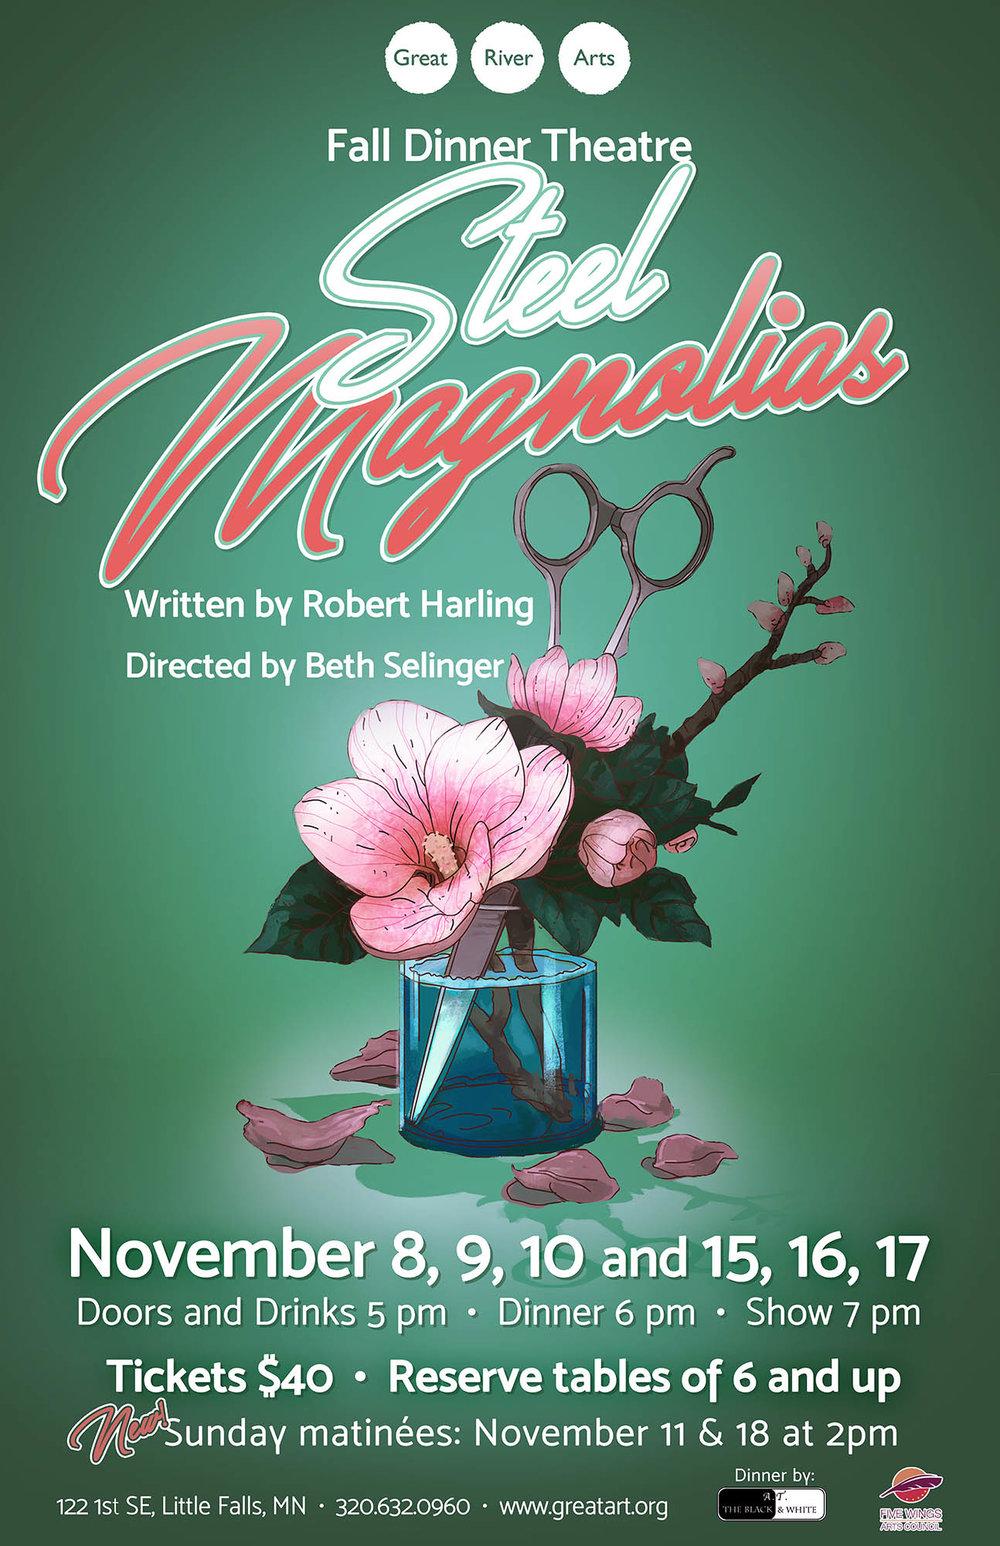 Steel-Magnolias-Poster-review.jpg